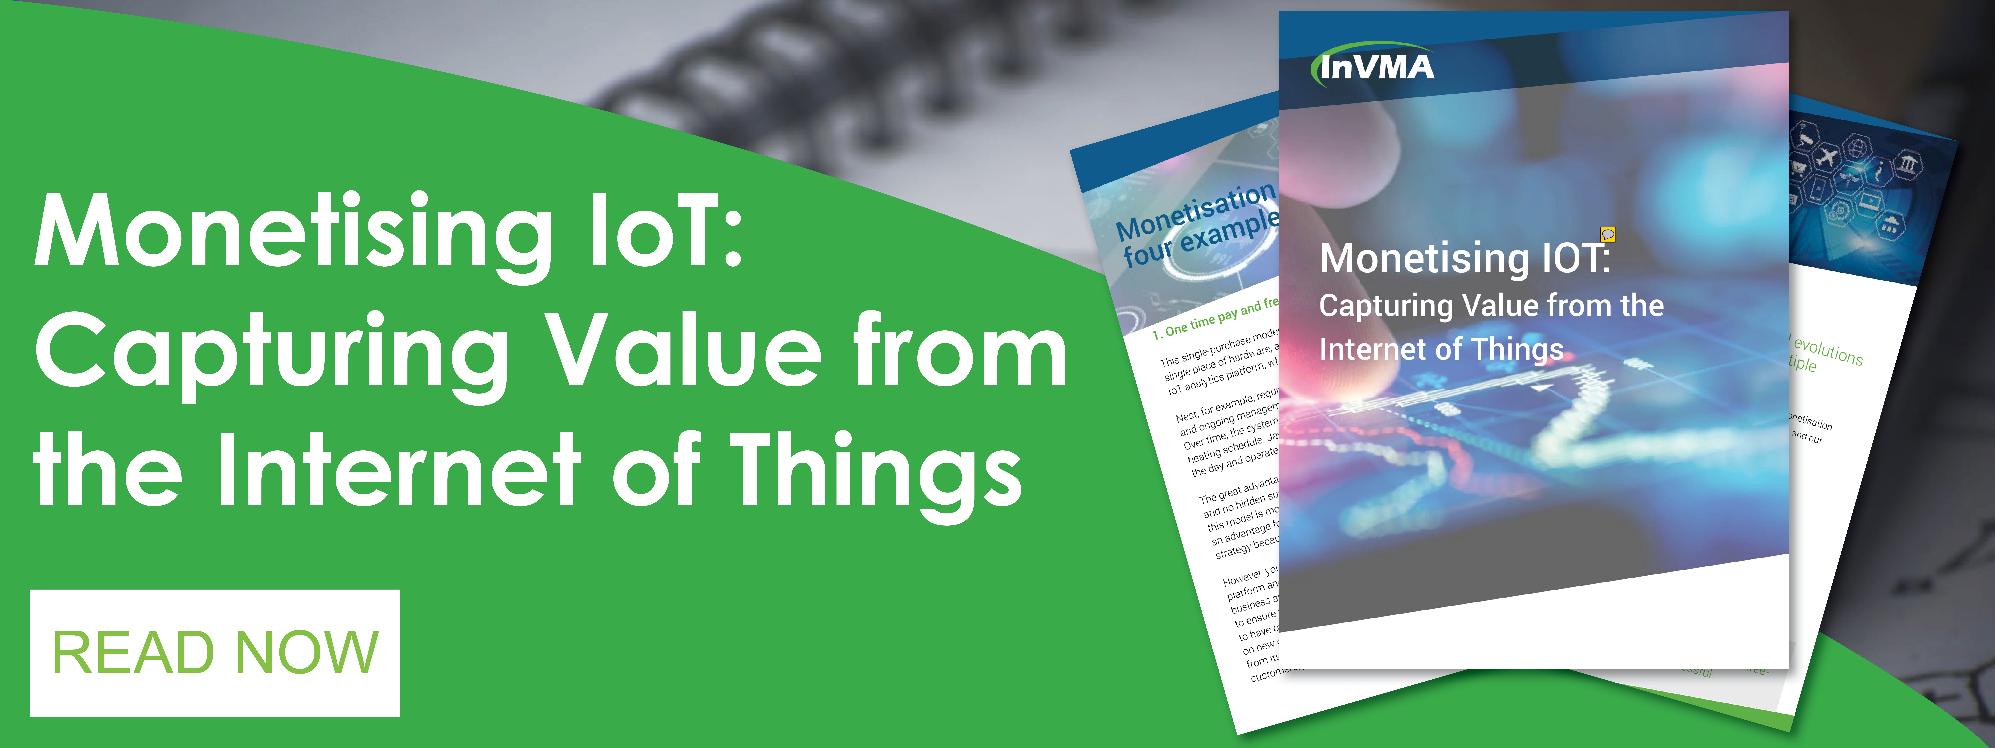 Monetising IoT